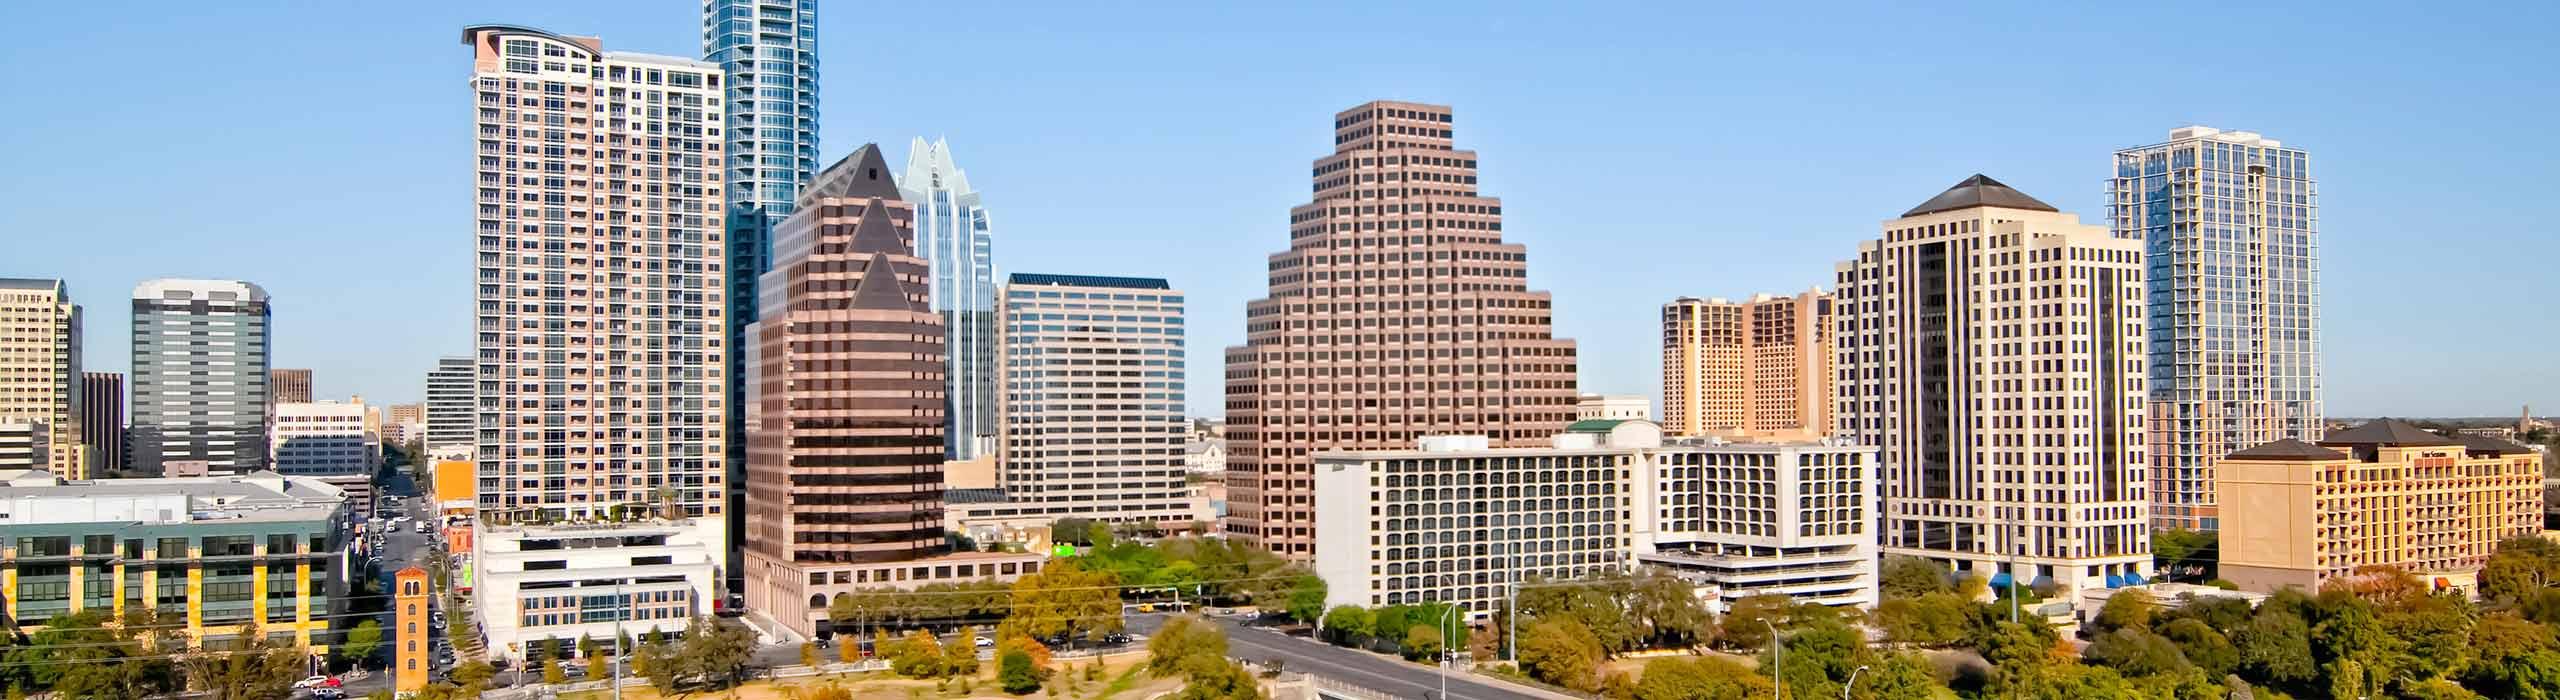 Austin City line